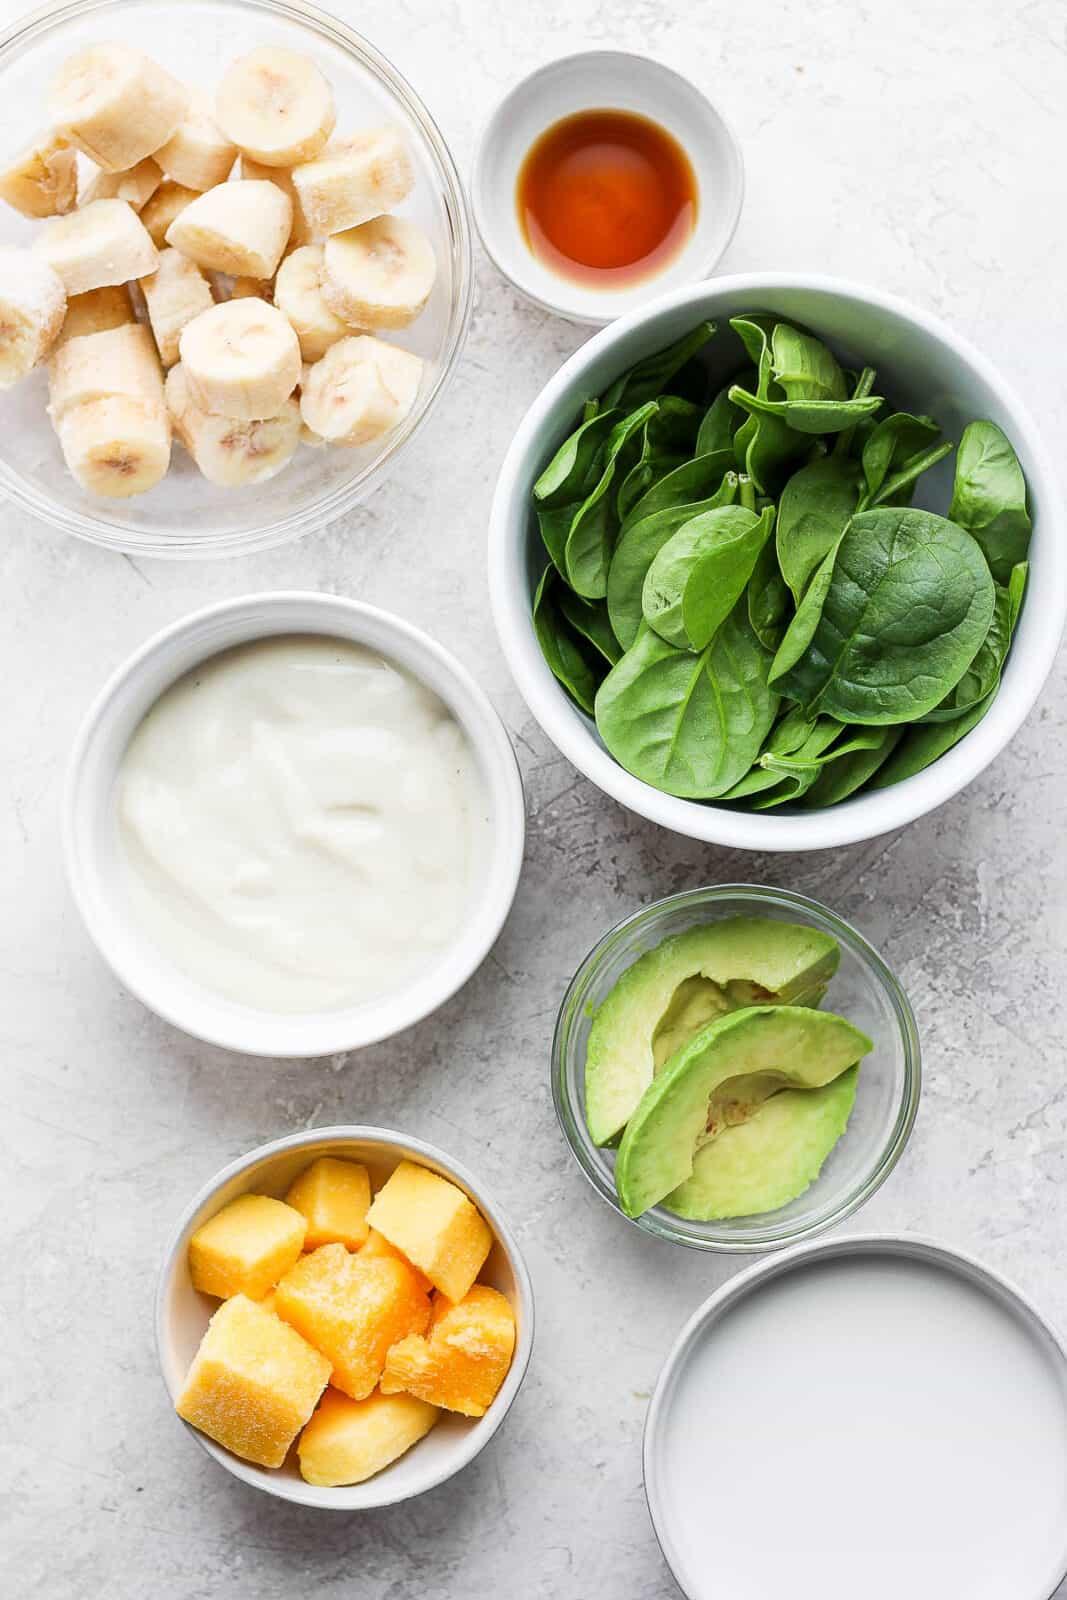 Green smoothie ingredients in separate bowls.